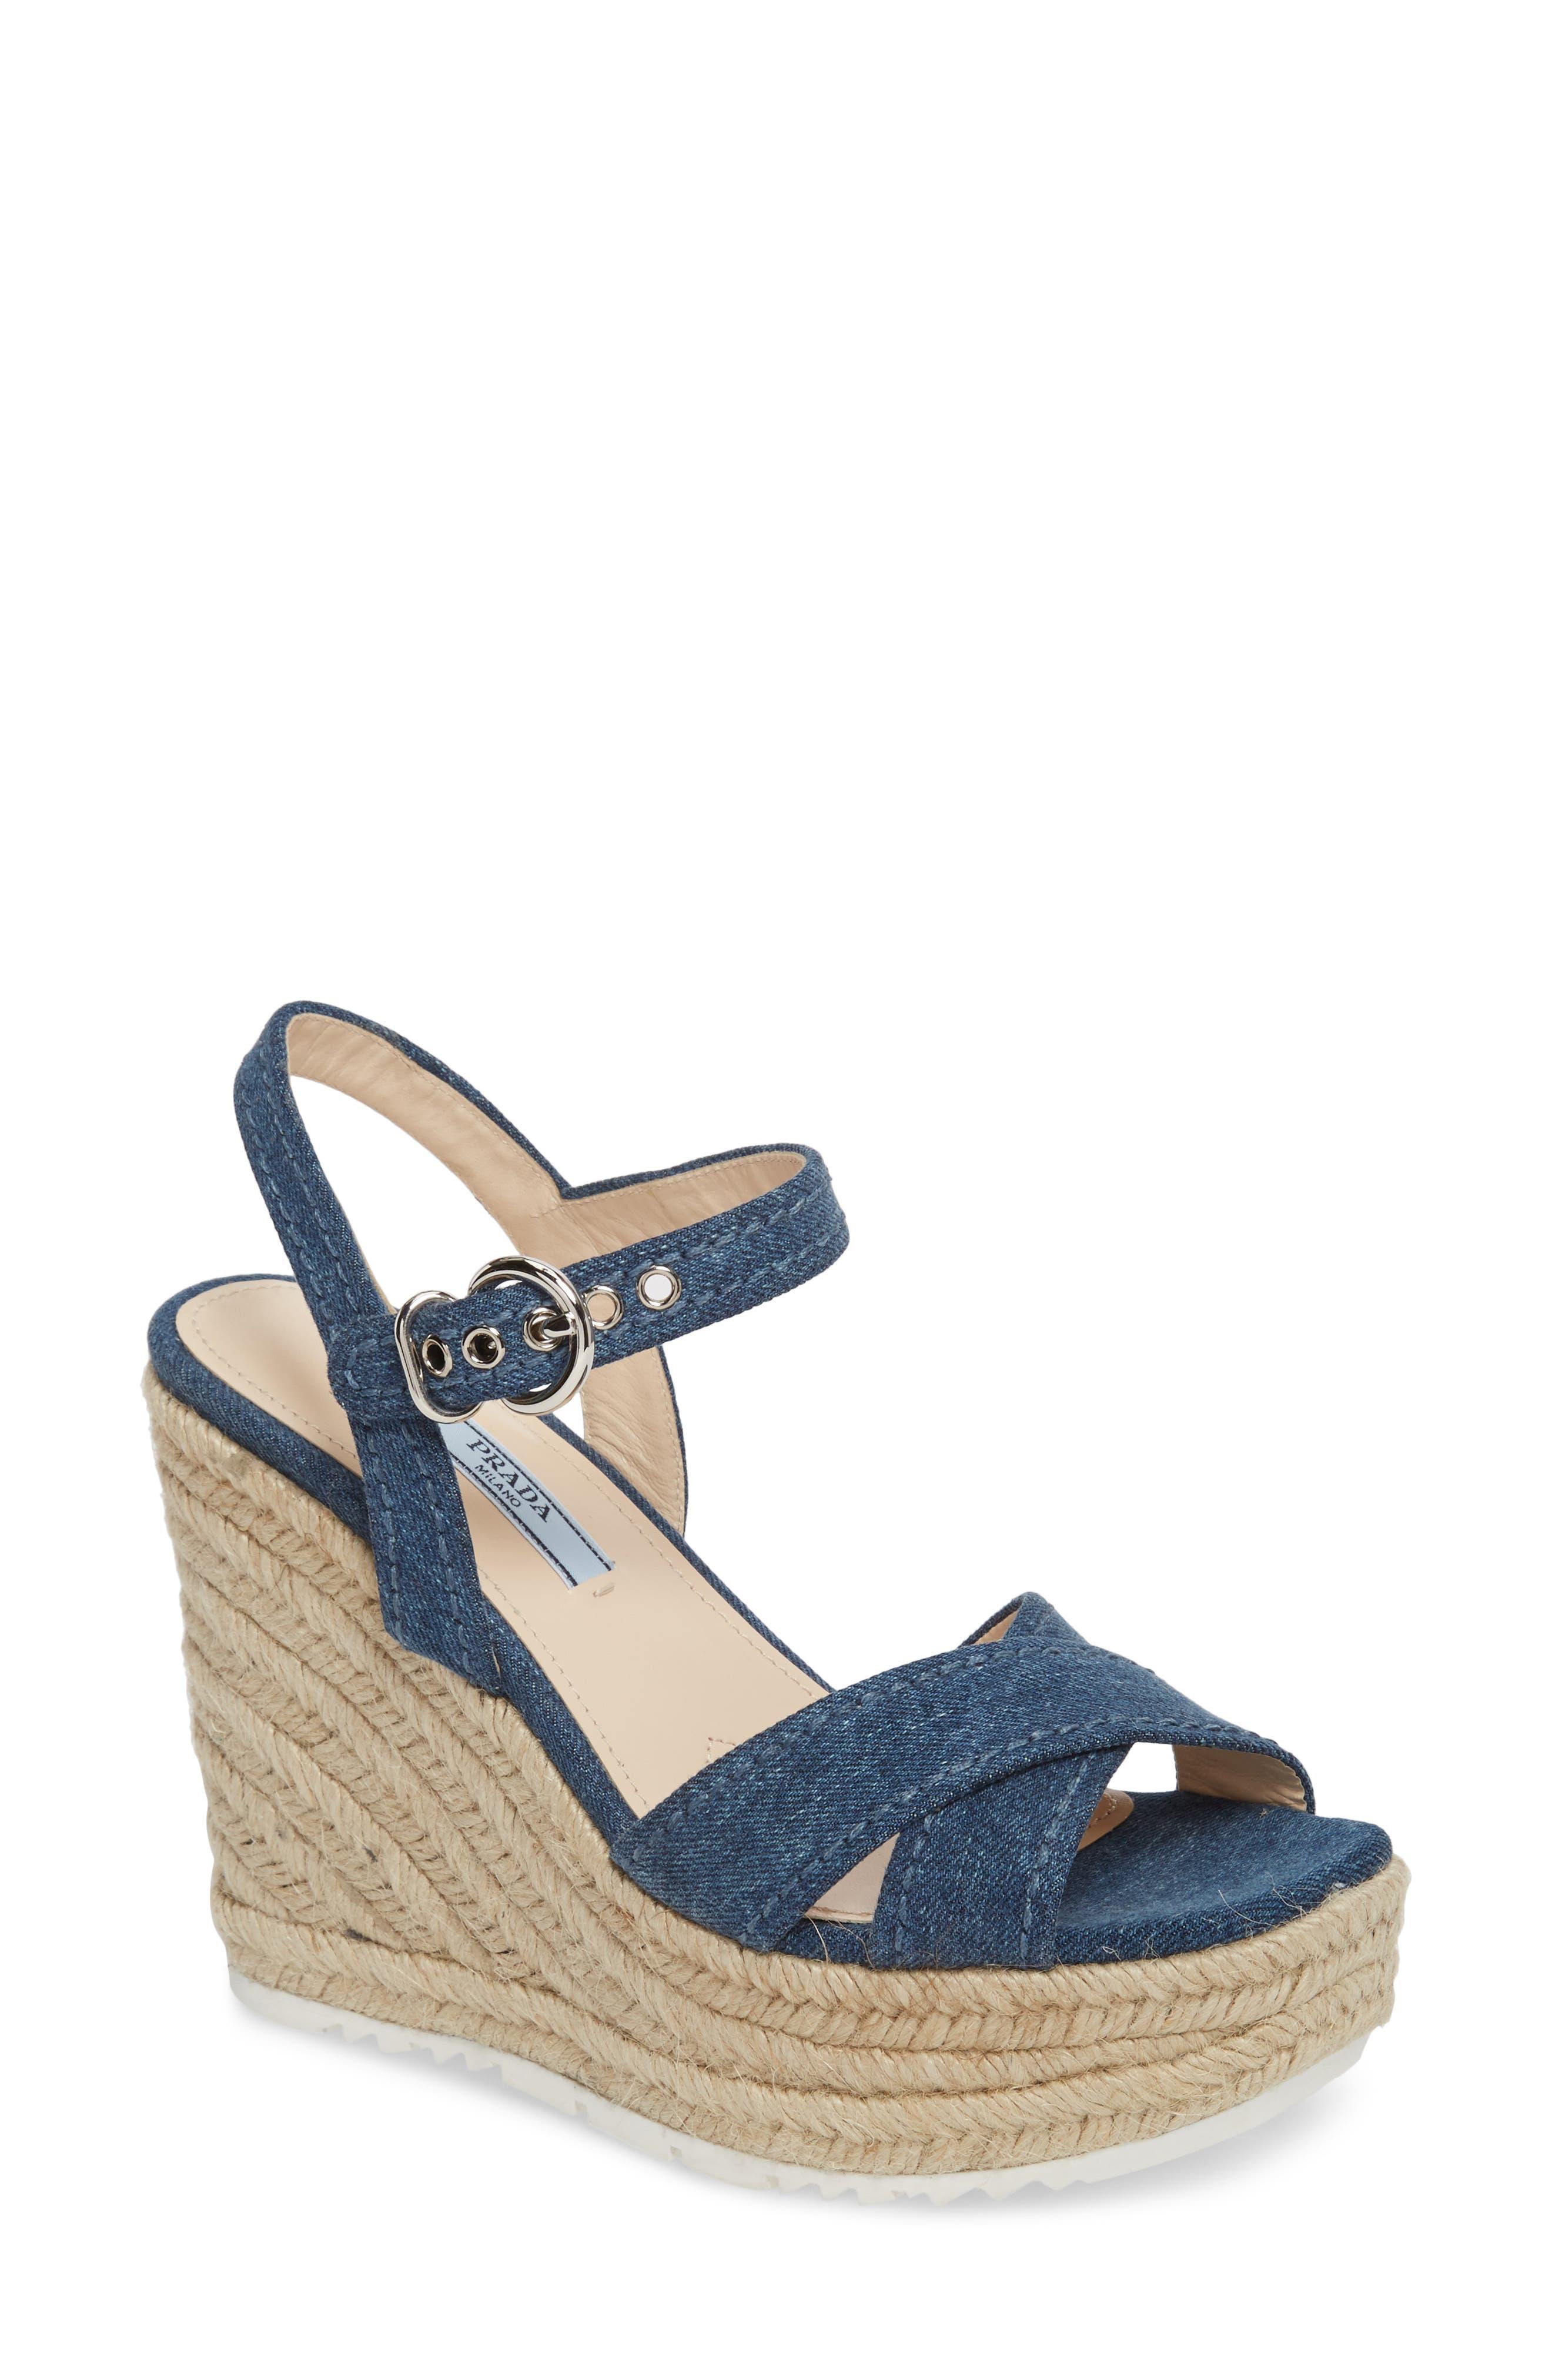 Espadrille Wedge Sandal,                             Main thumbnail 1, color,                             Blue